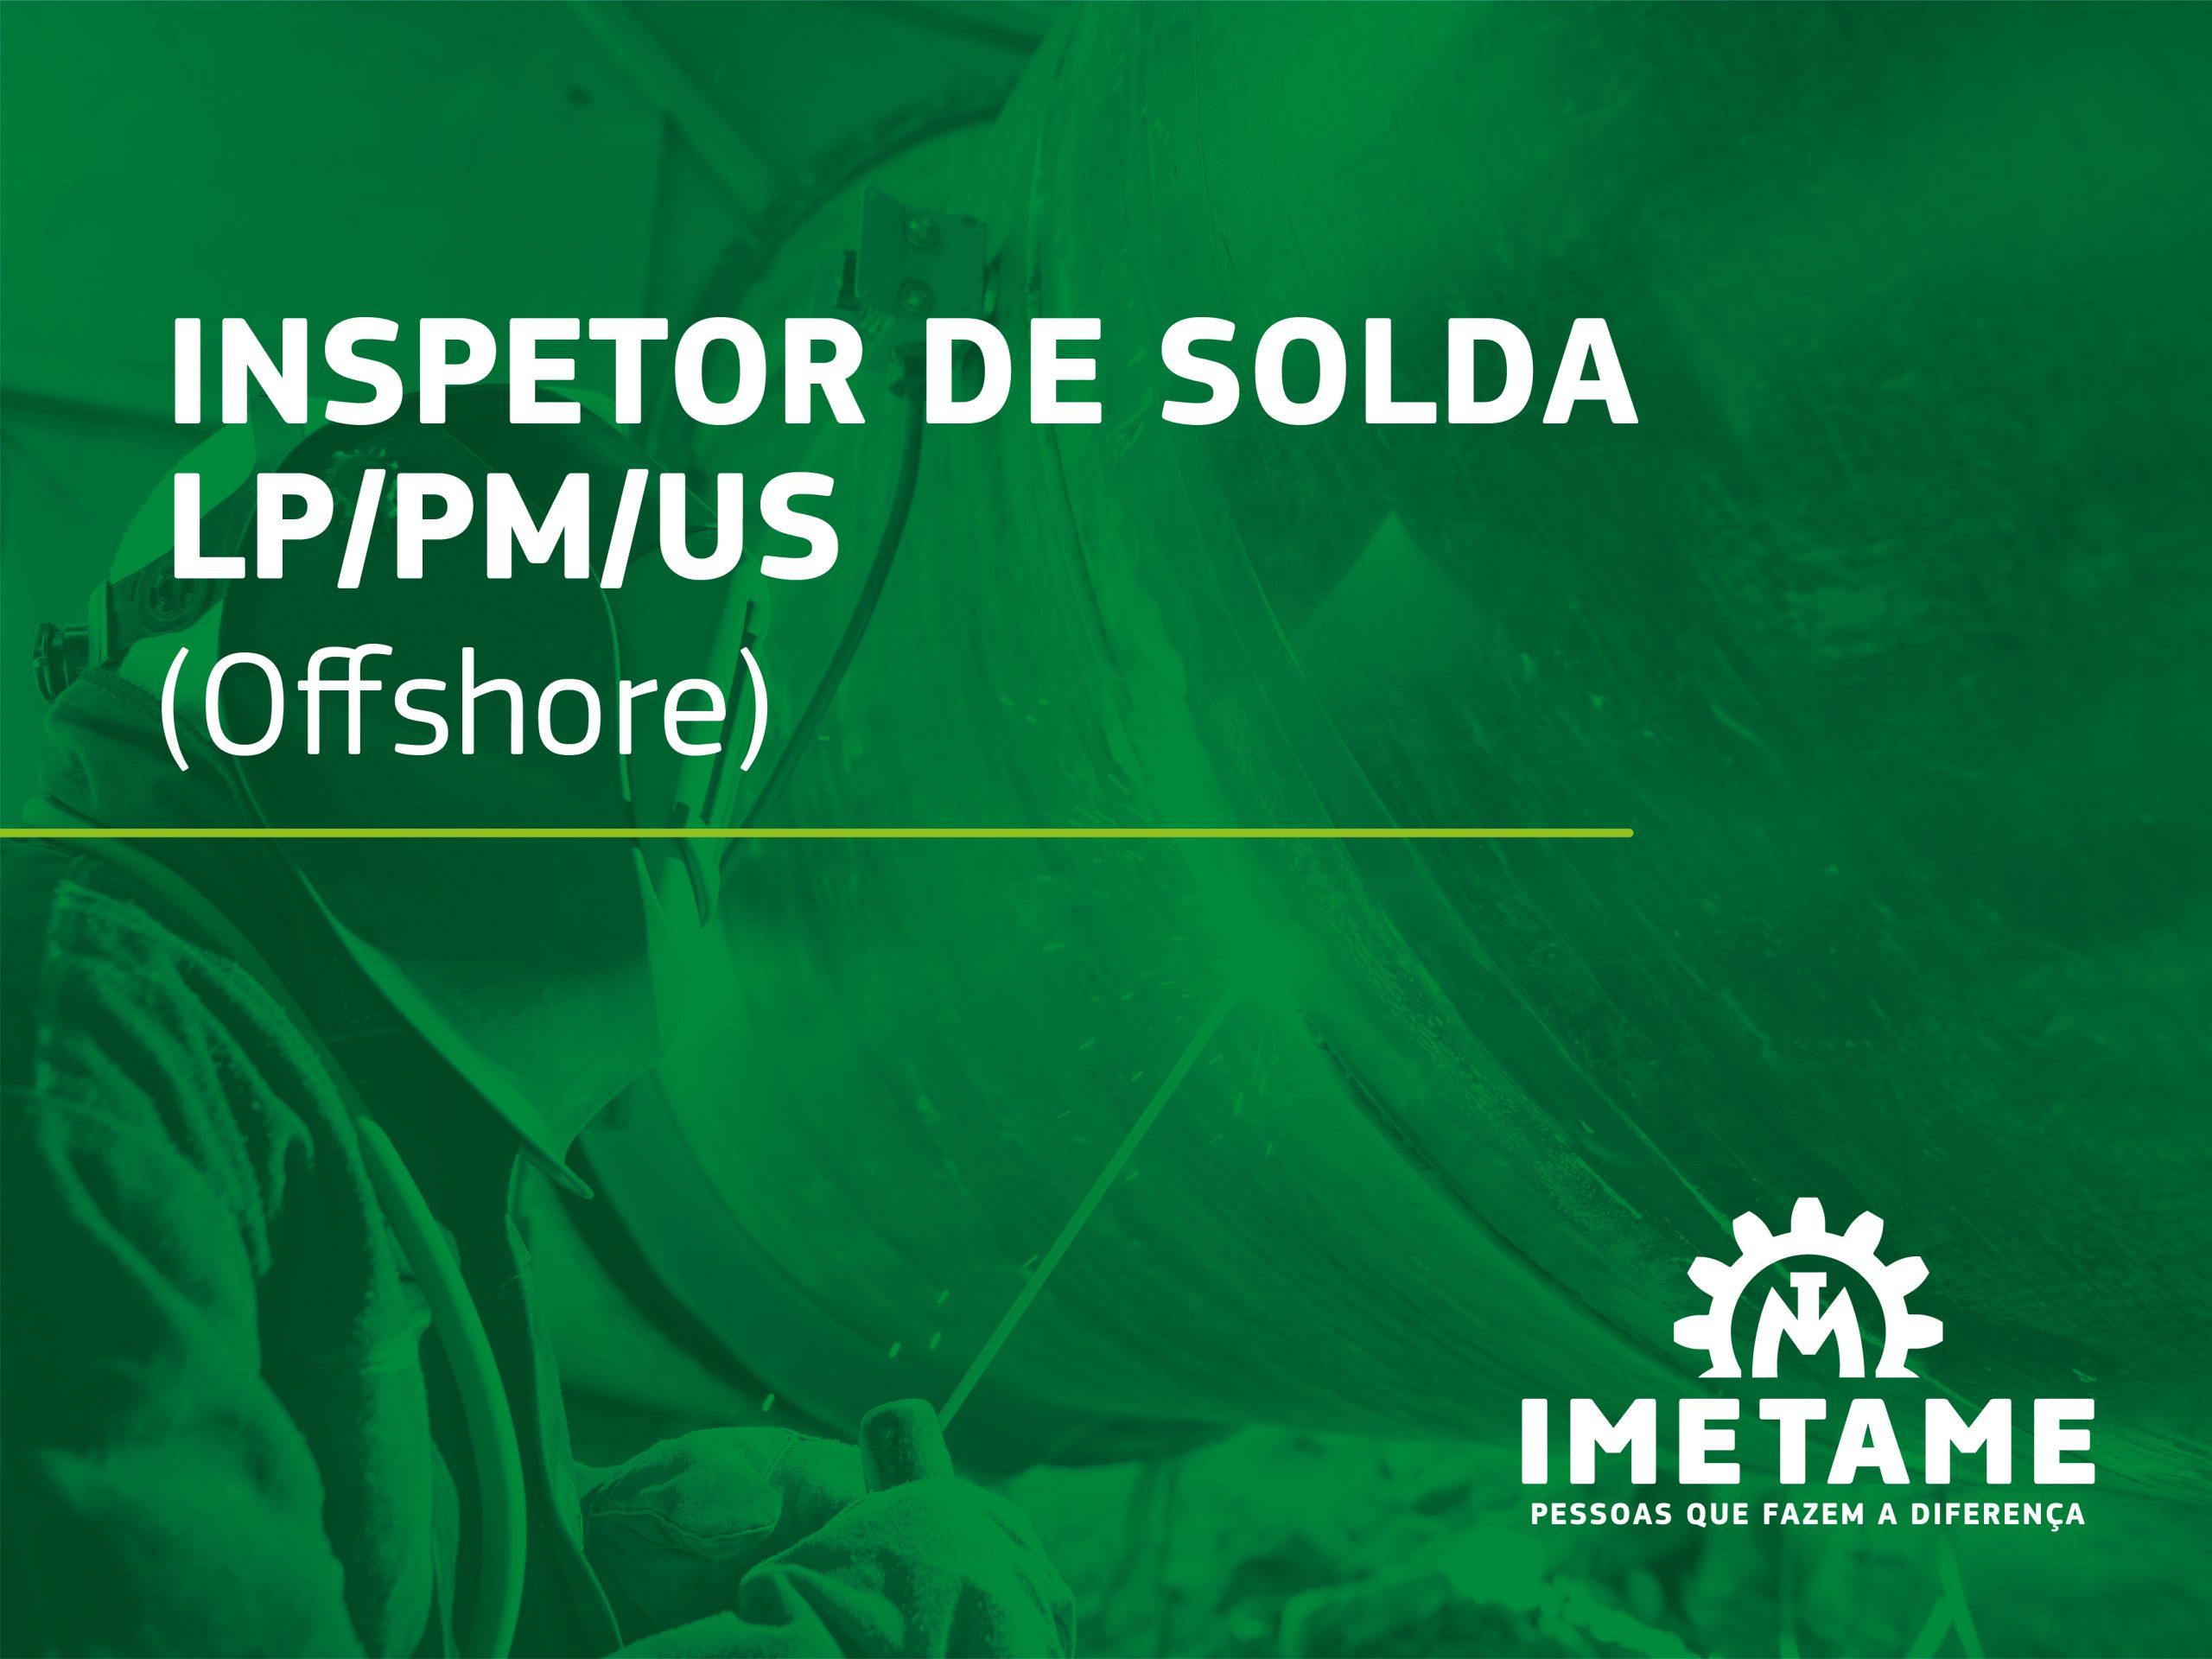 Inspetor de Solda LP/PM/US – Offshore